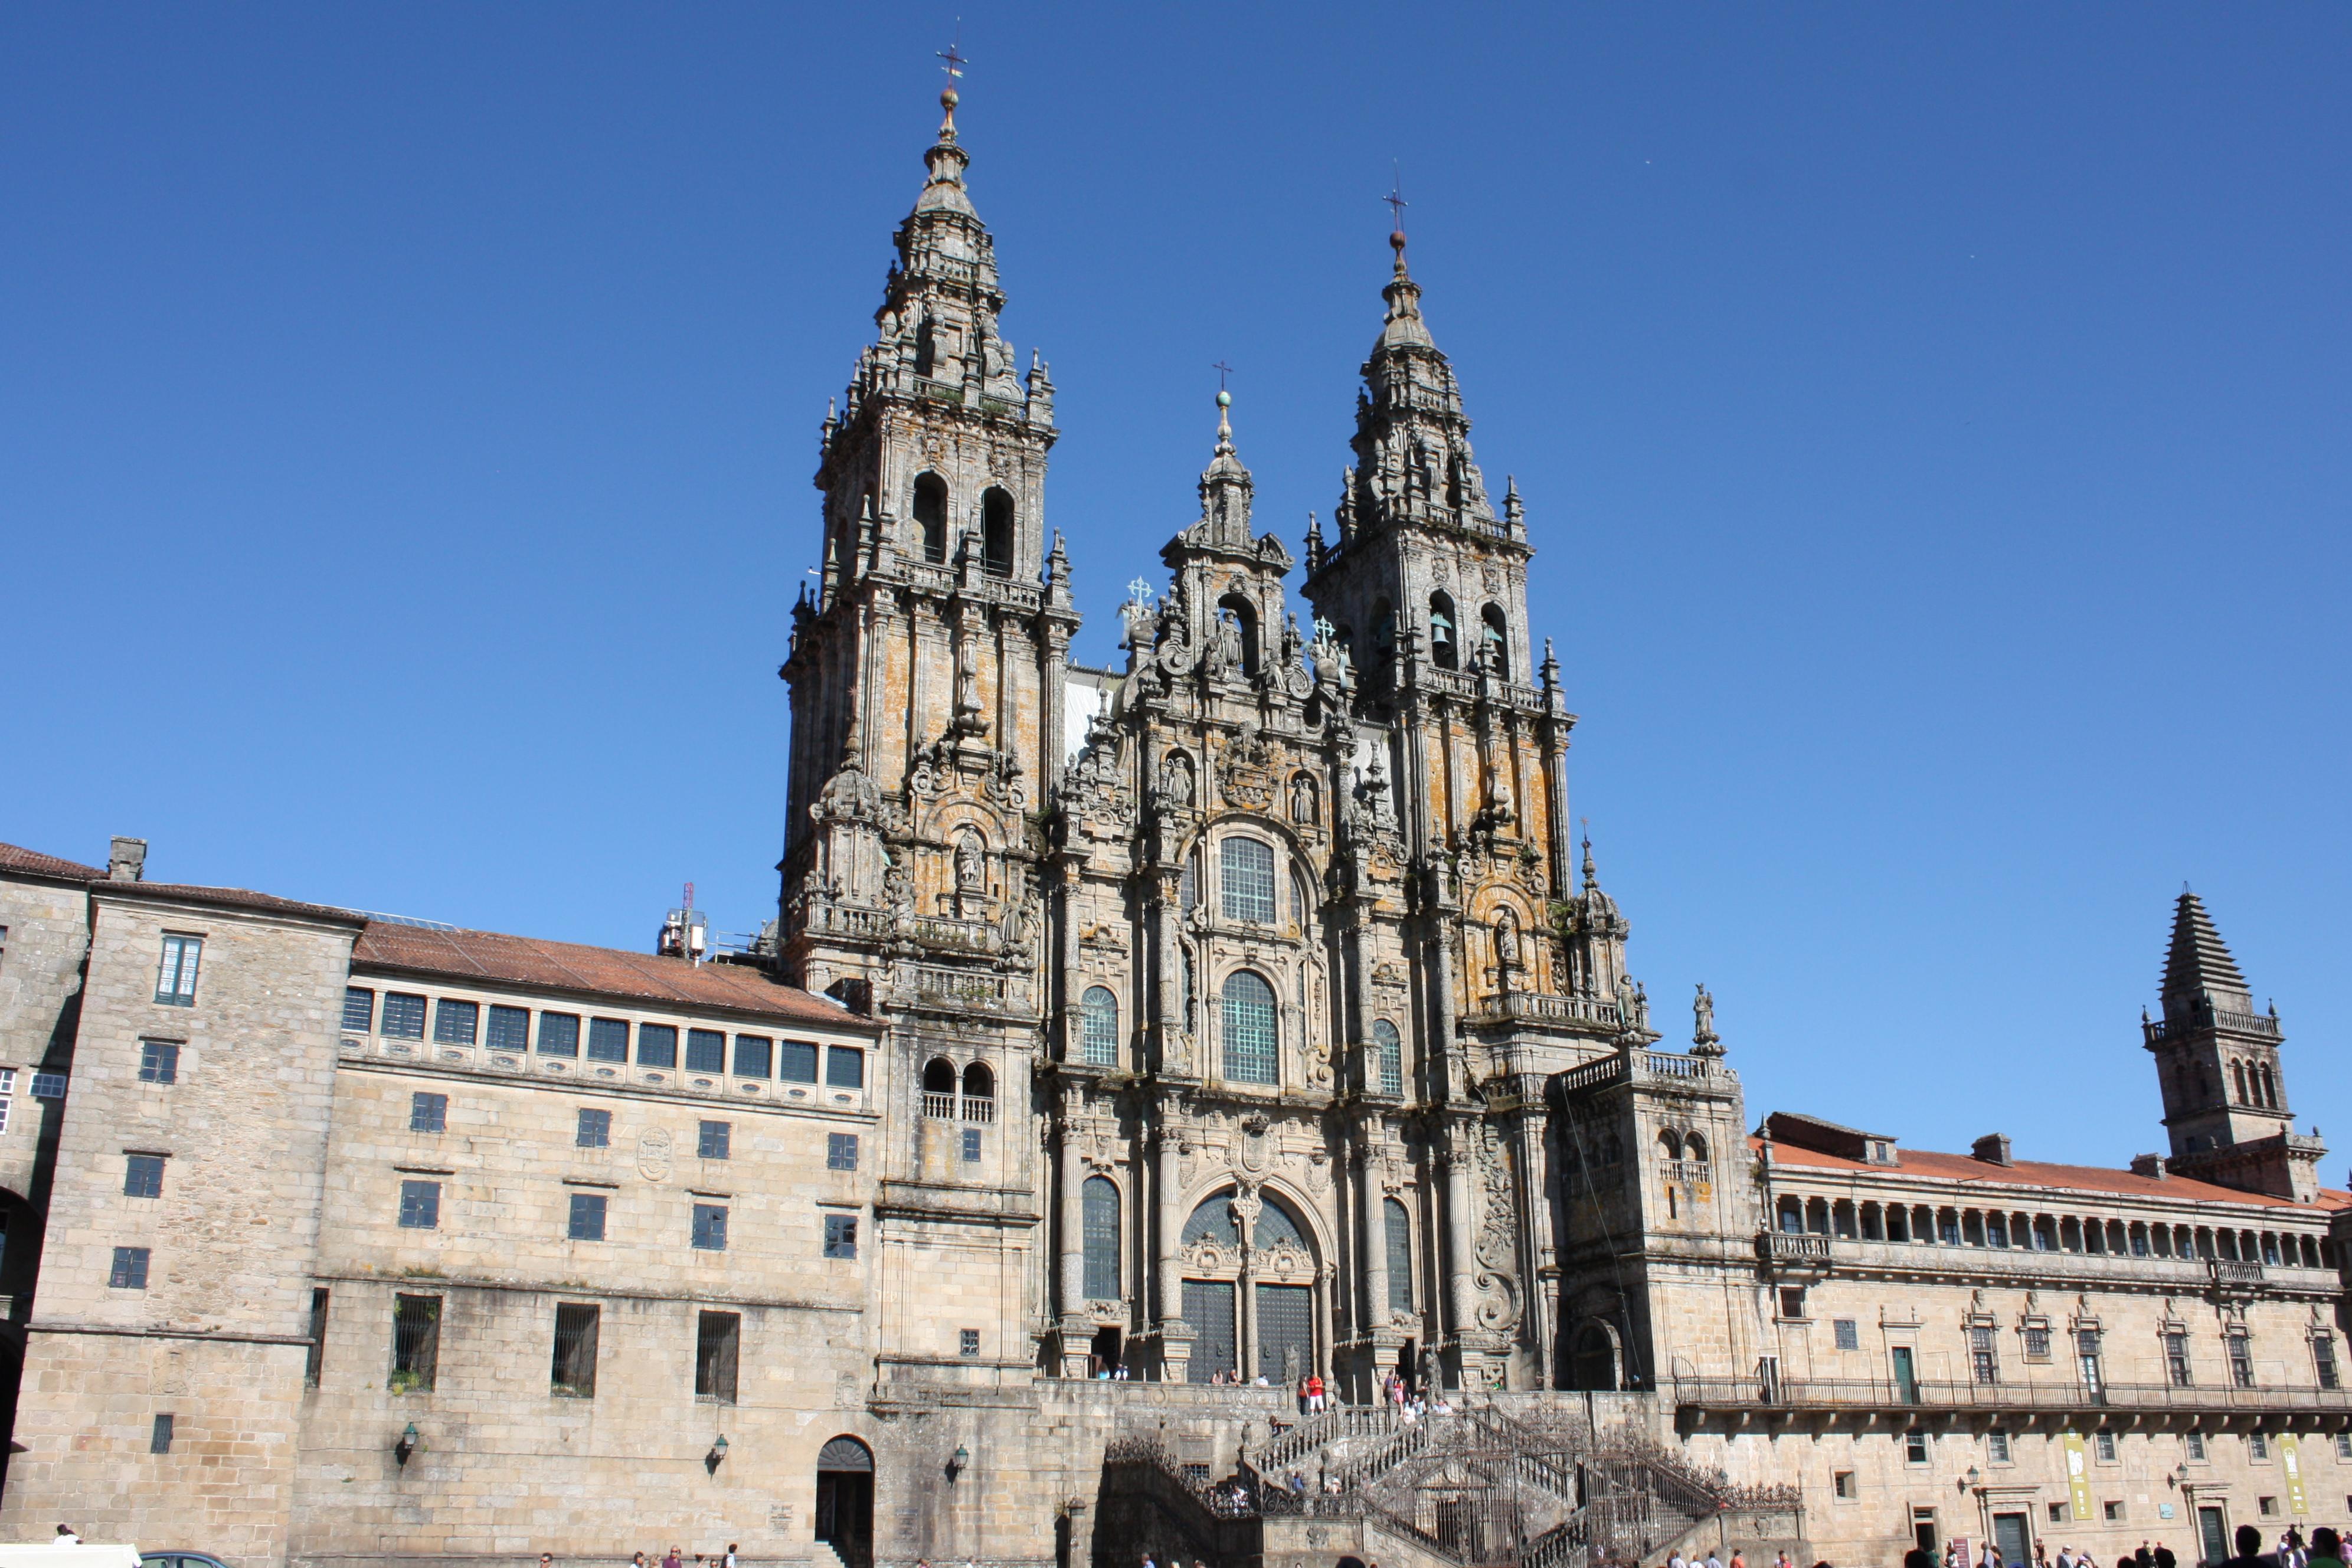 Unesco world heritage sites challenge santiago de - Arrokabe arquitectos santiago de compostela ...